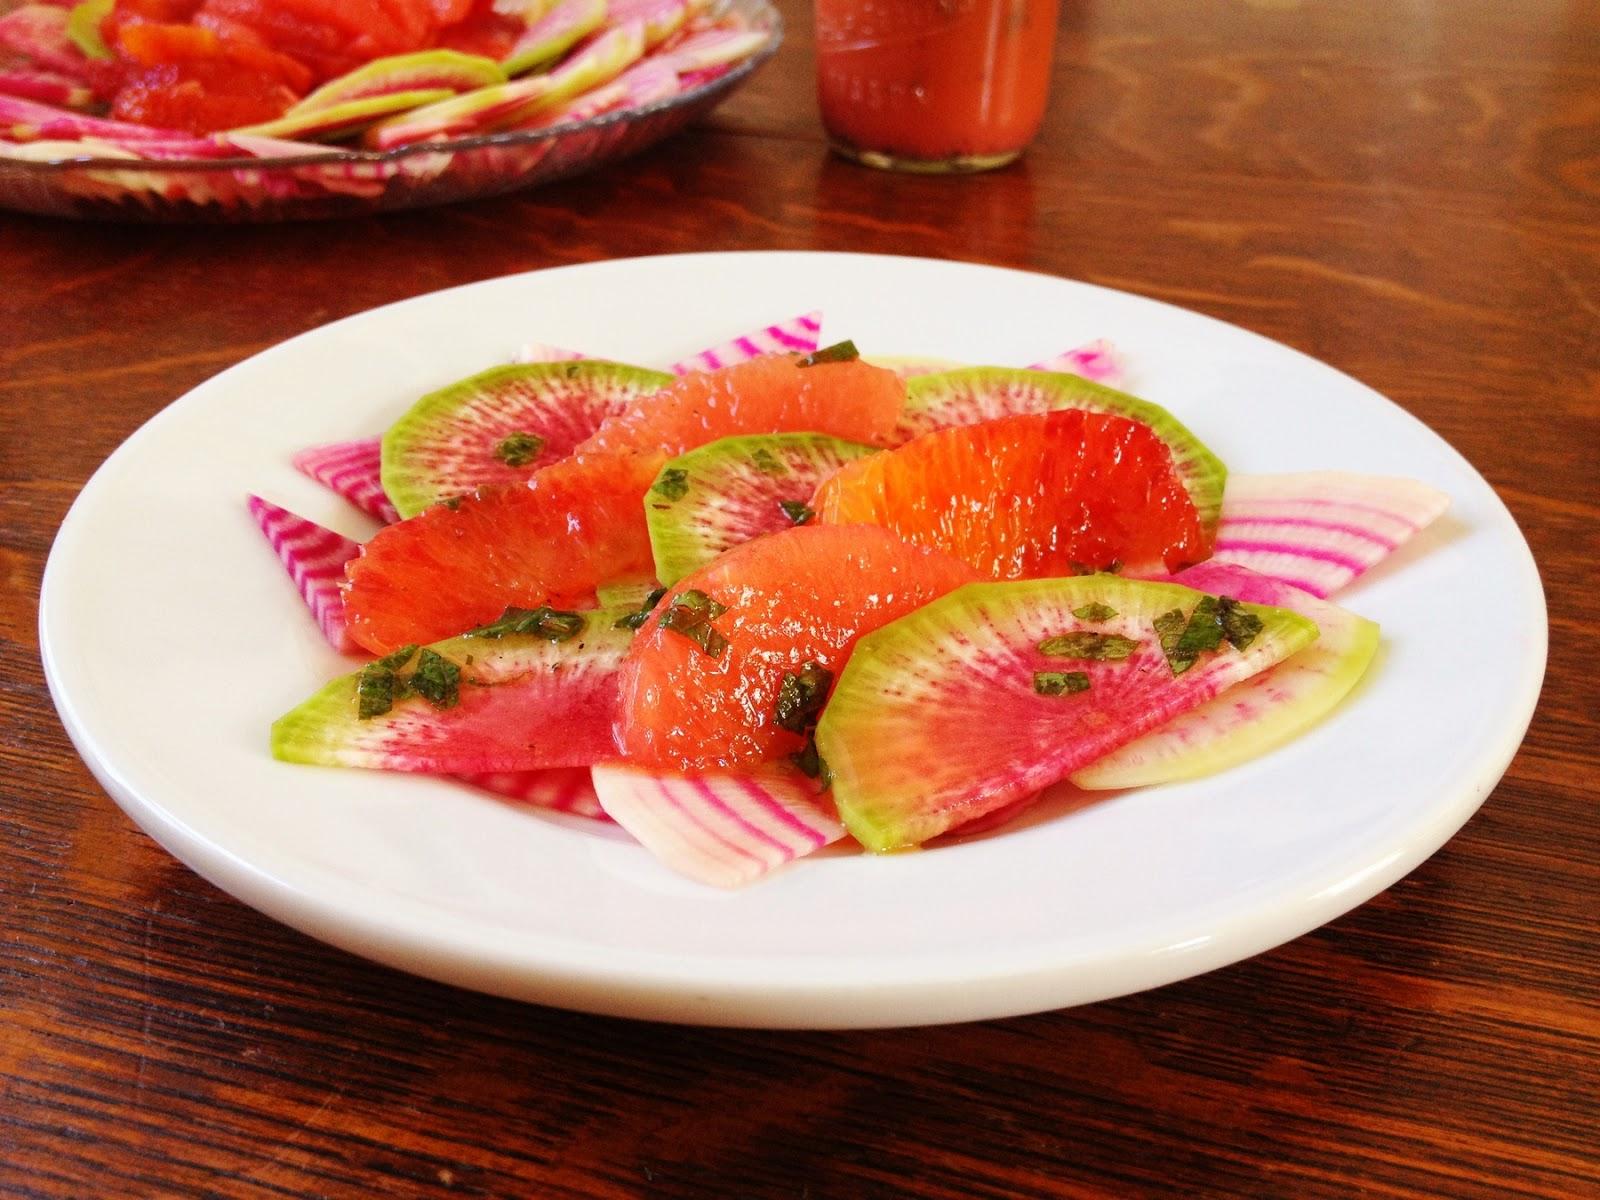 eat. drink. adventure.: Watermelon Radish & Citrus Salad